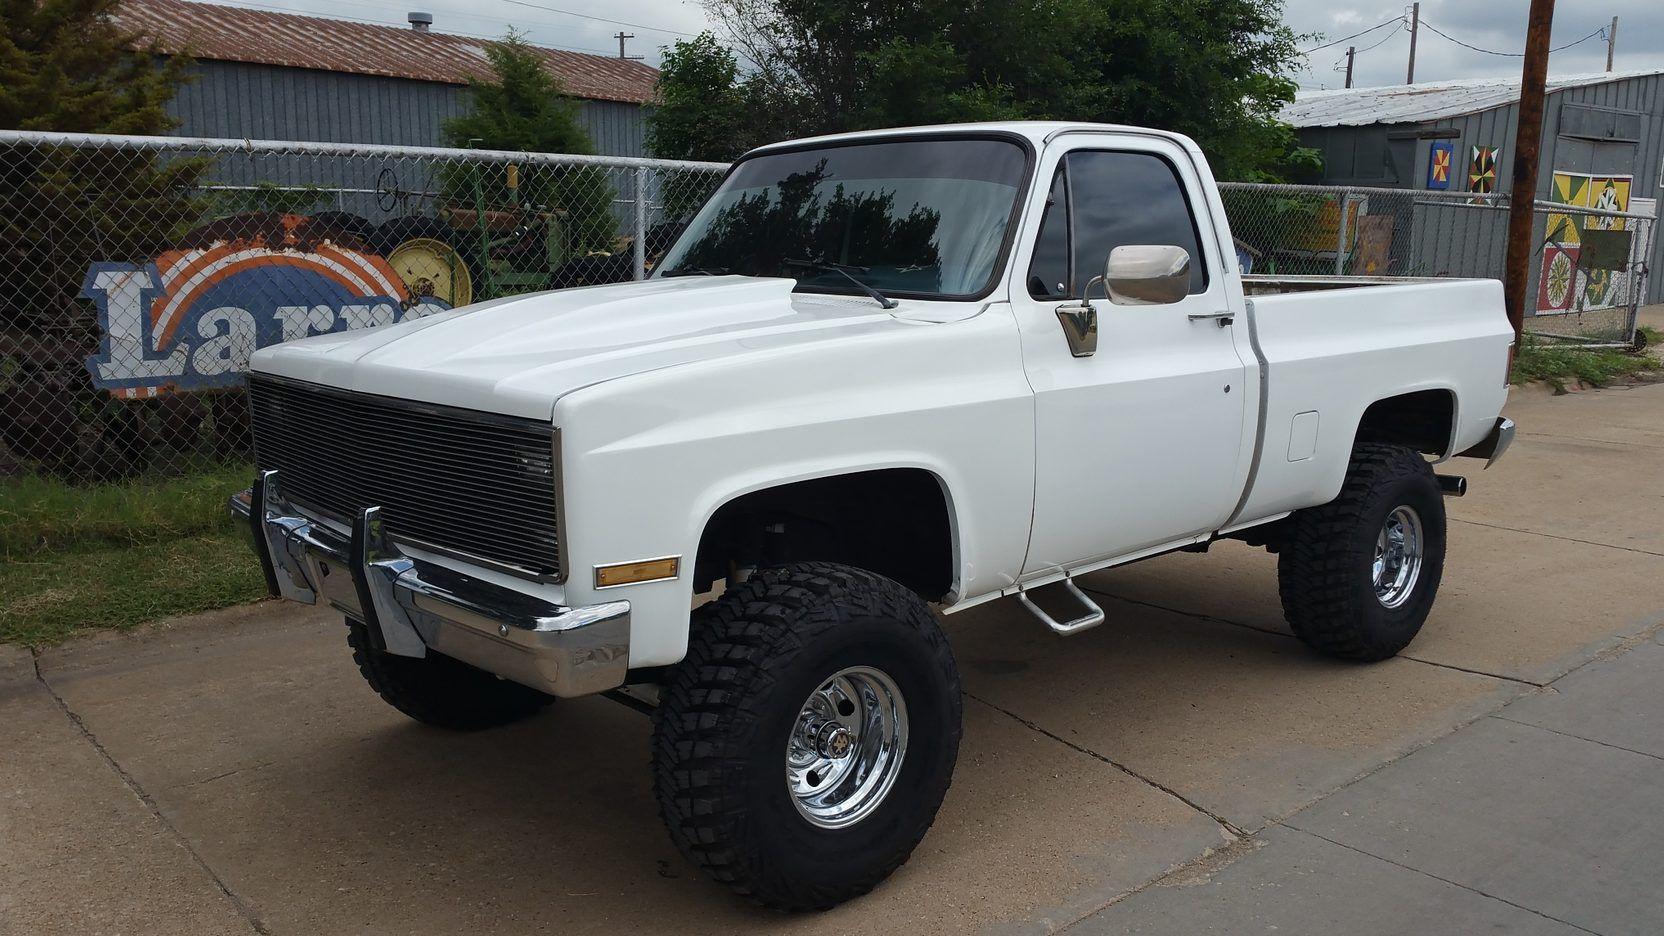 1986 Chevrolet K1500 Pickup Short Bed 4 Wheel Drive Lot S62 Denver 2016 Mecum Auctions Chevrolet Mecum Auction Monster Trucks